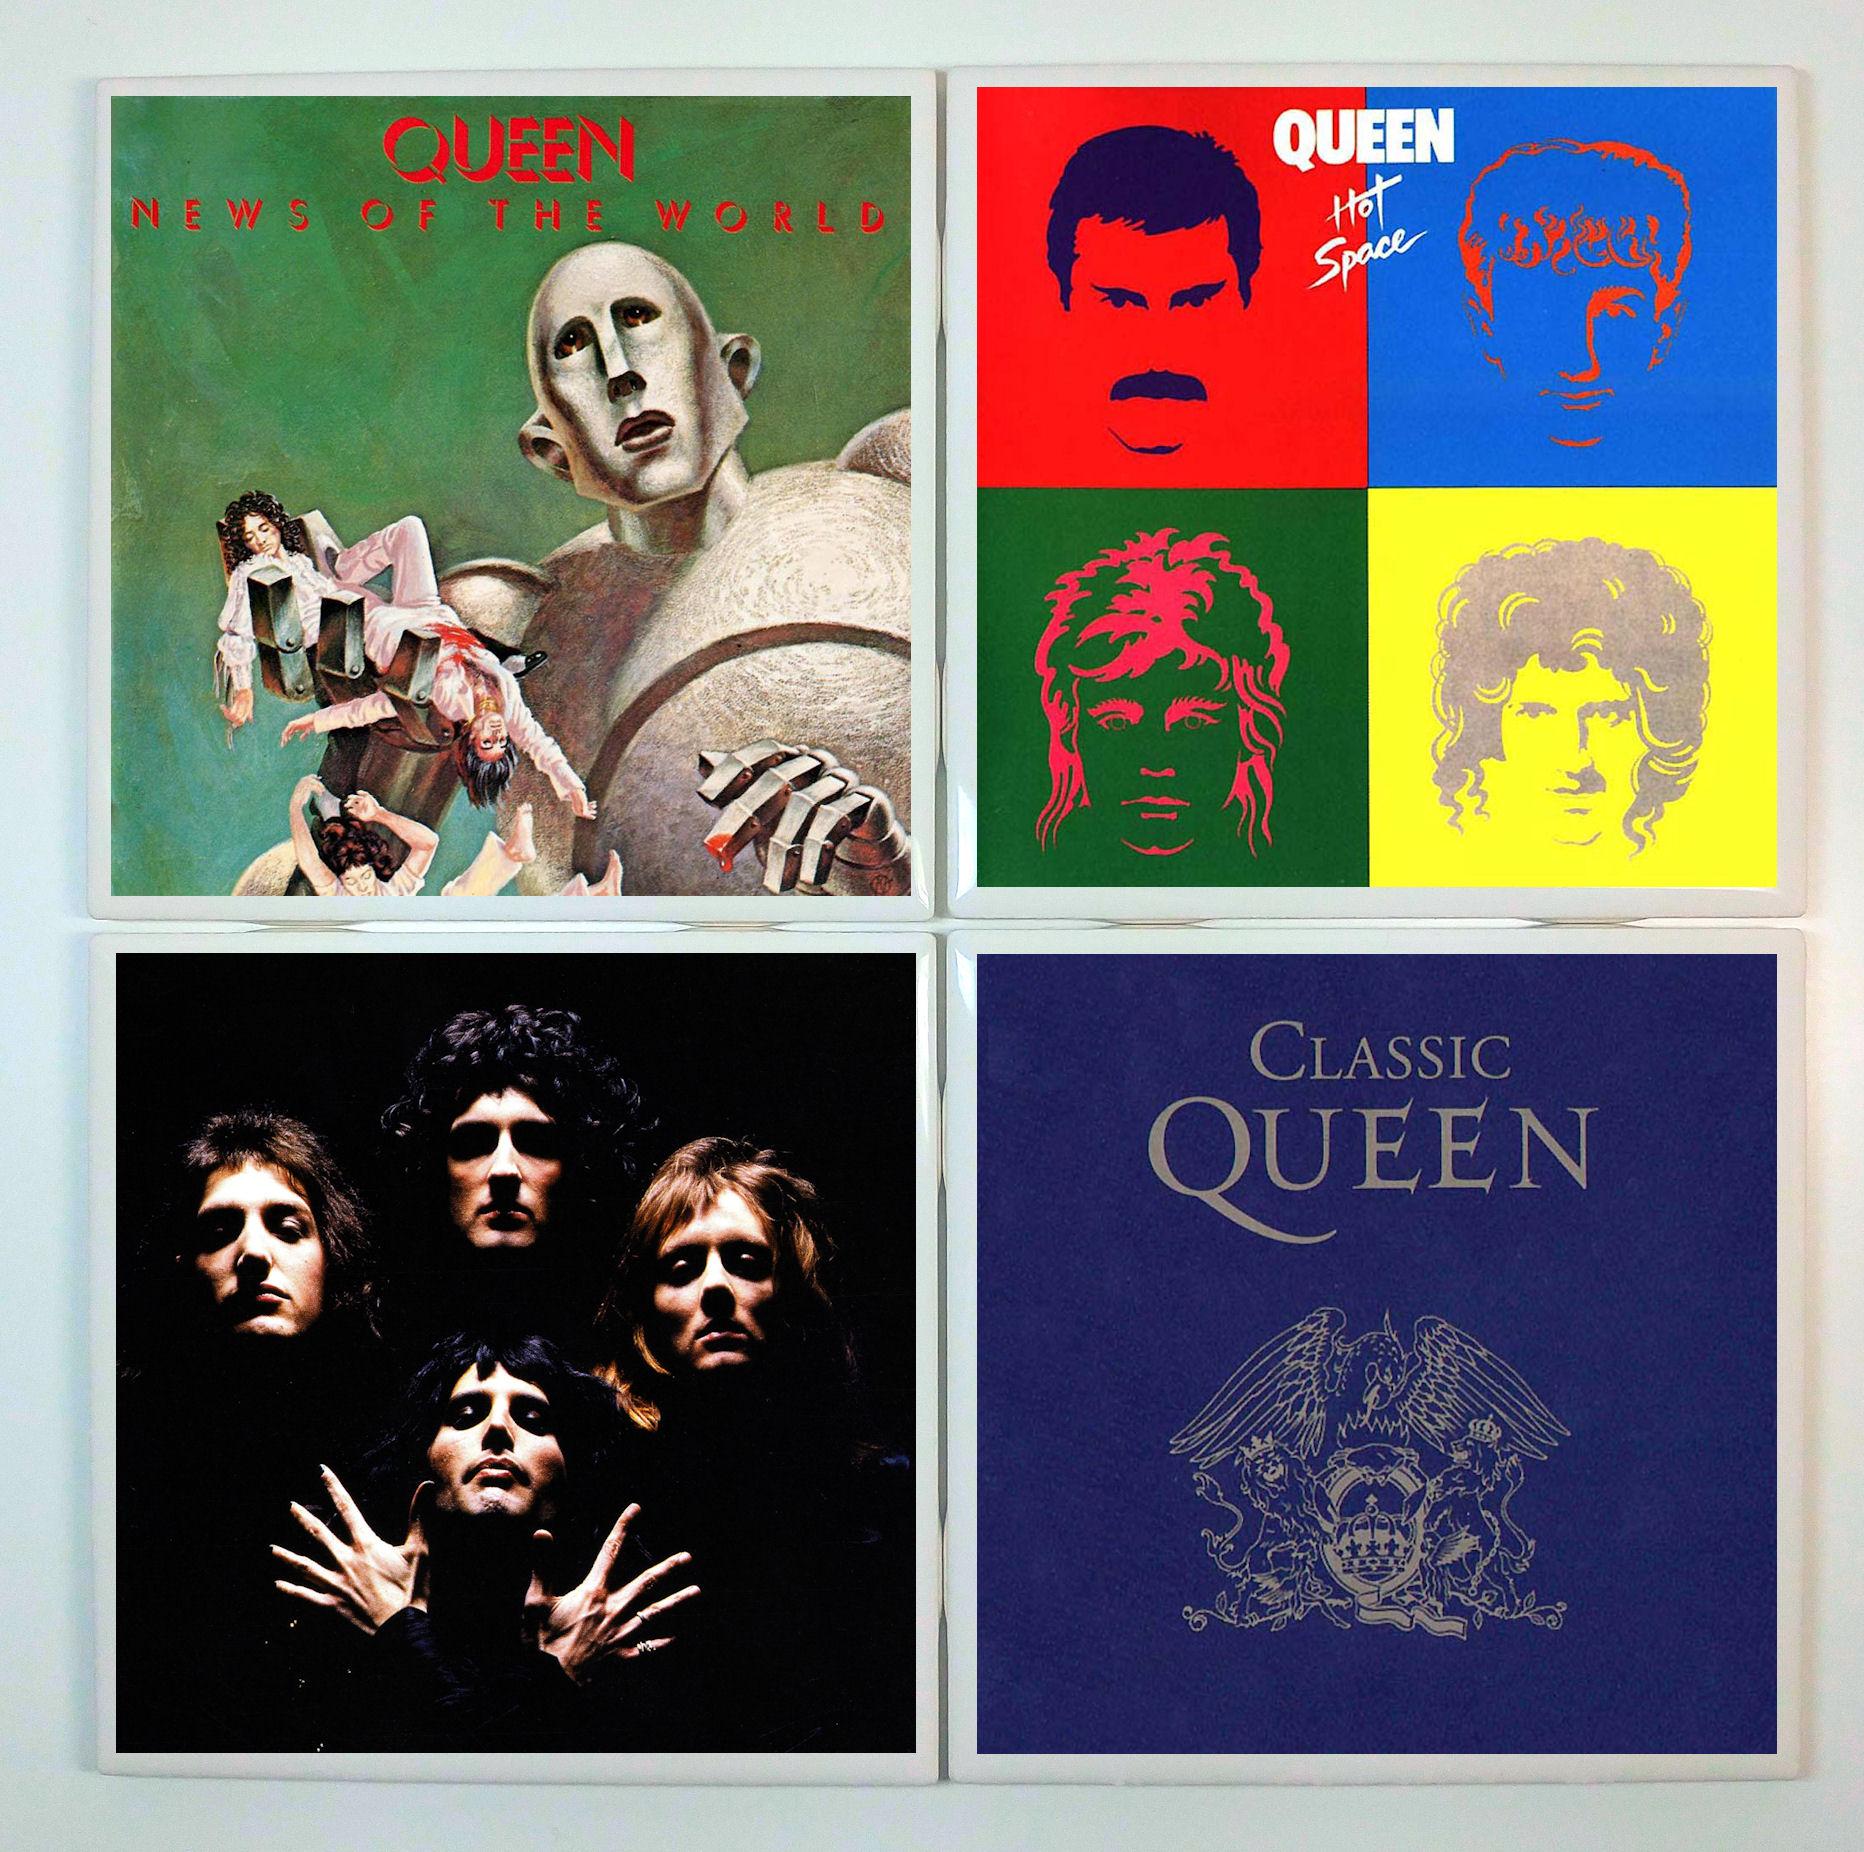 Queen Bohemian Rhapsody Album Cover | Belgium Hotels 5 Star